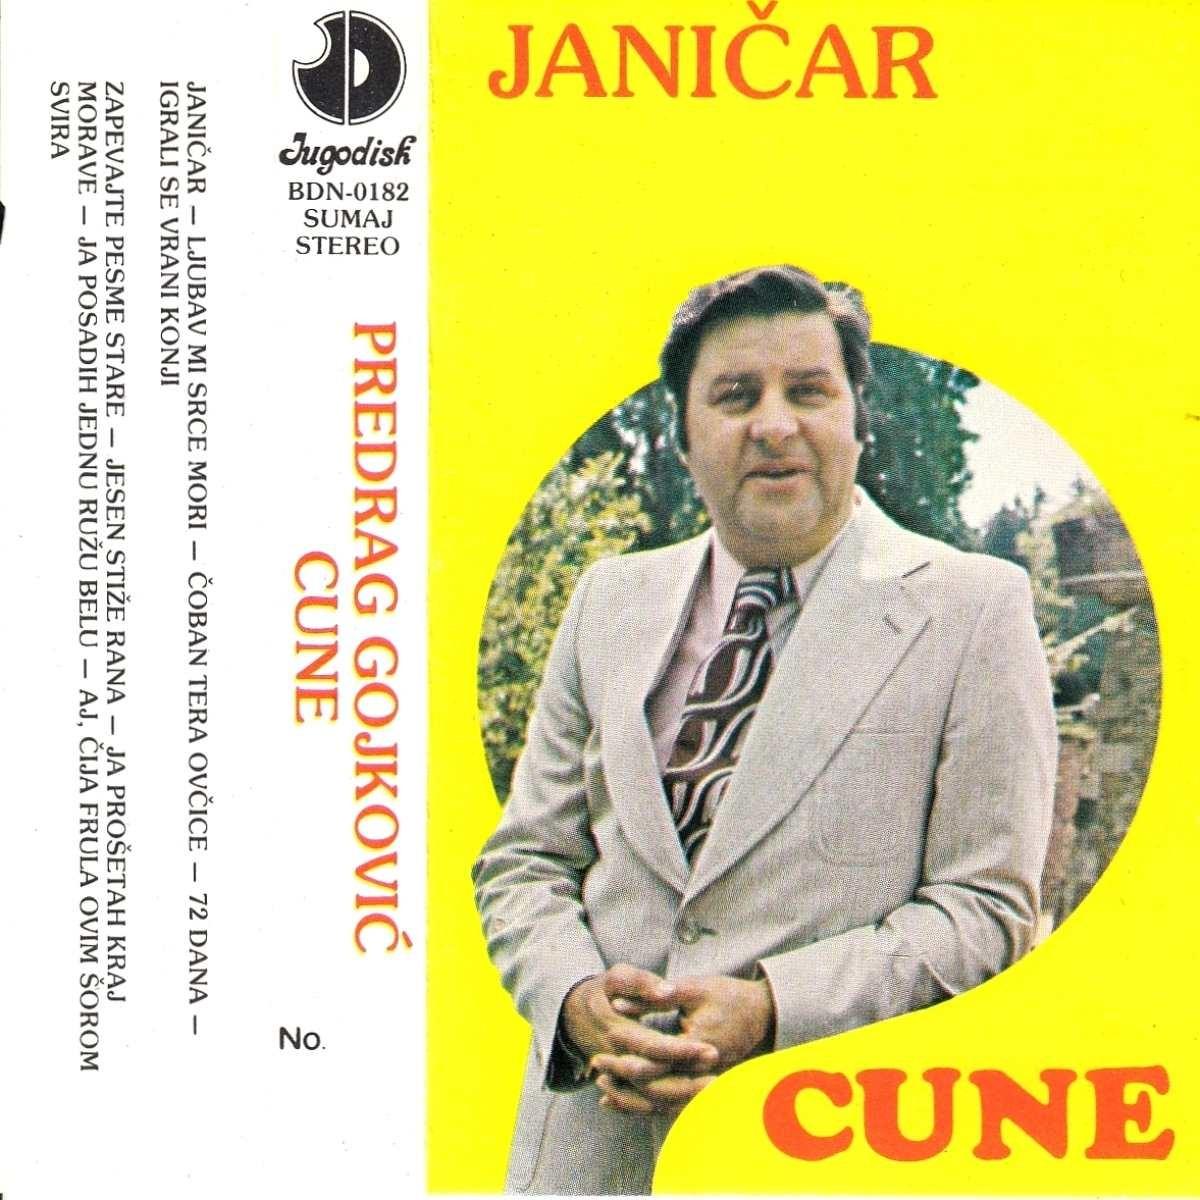 Gojković Predrag Cune - Janičar